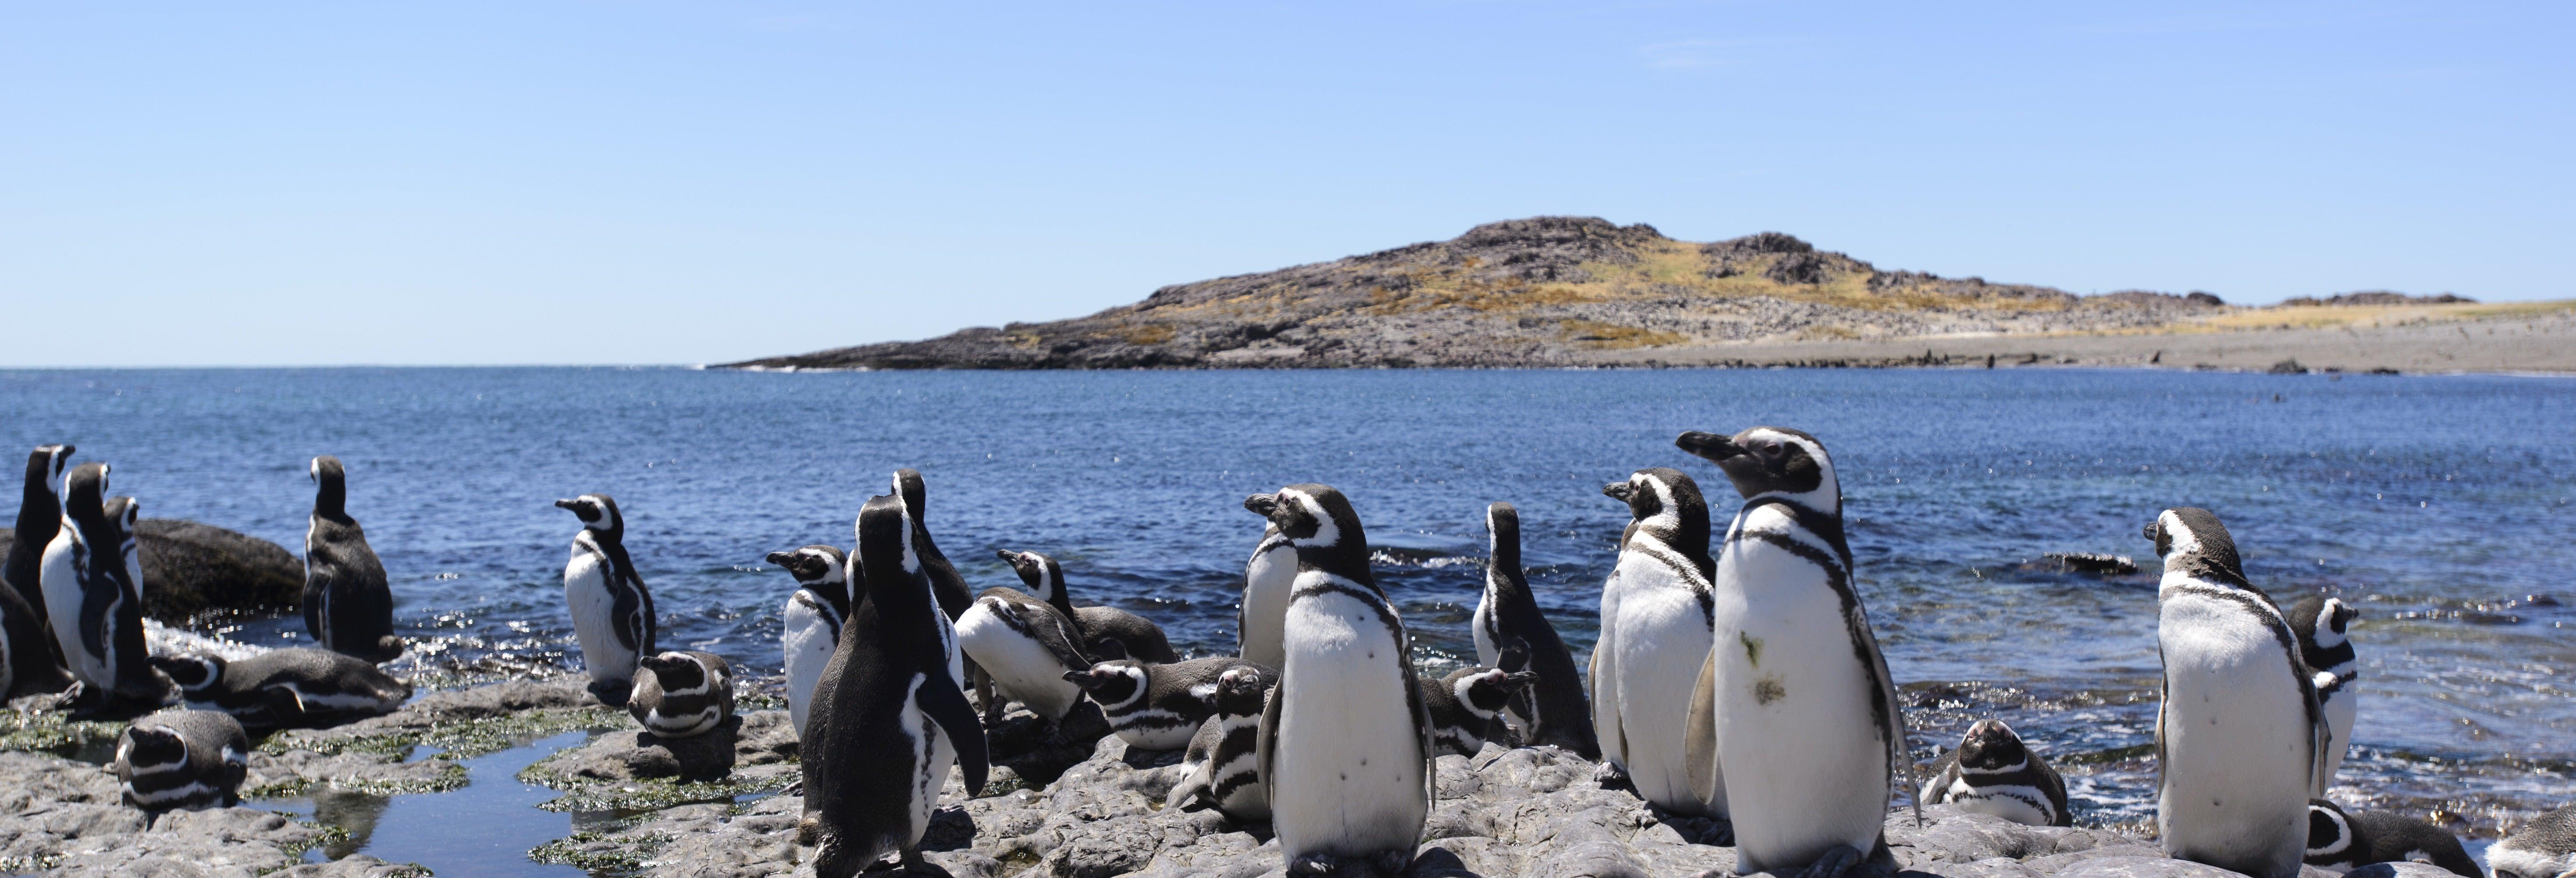 Avistamiento de animales en Punta Tombo e Isla Escondida